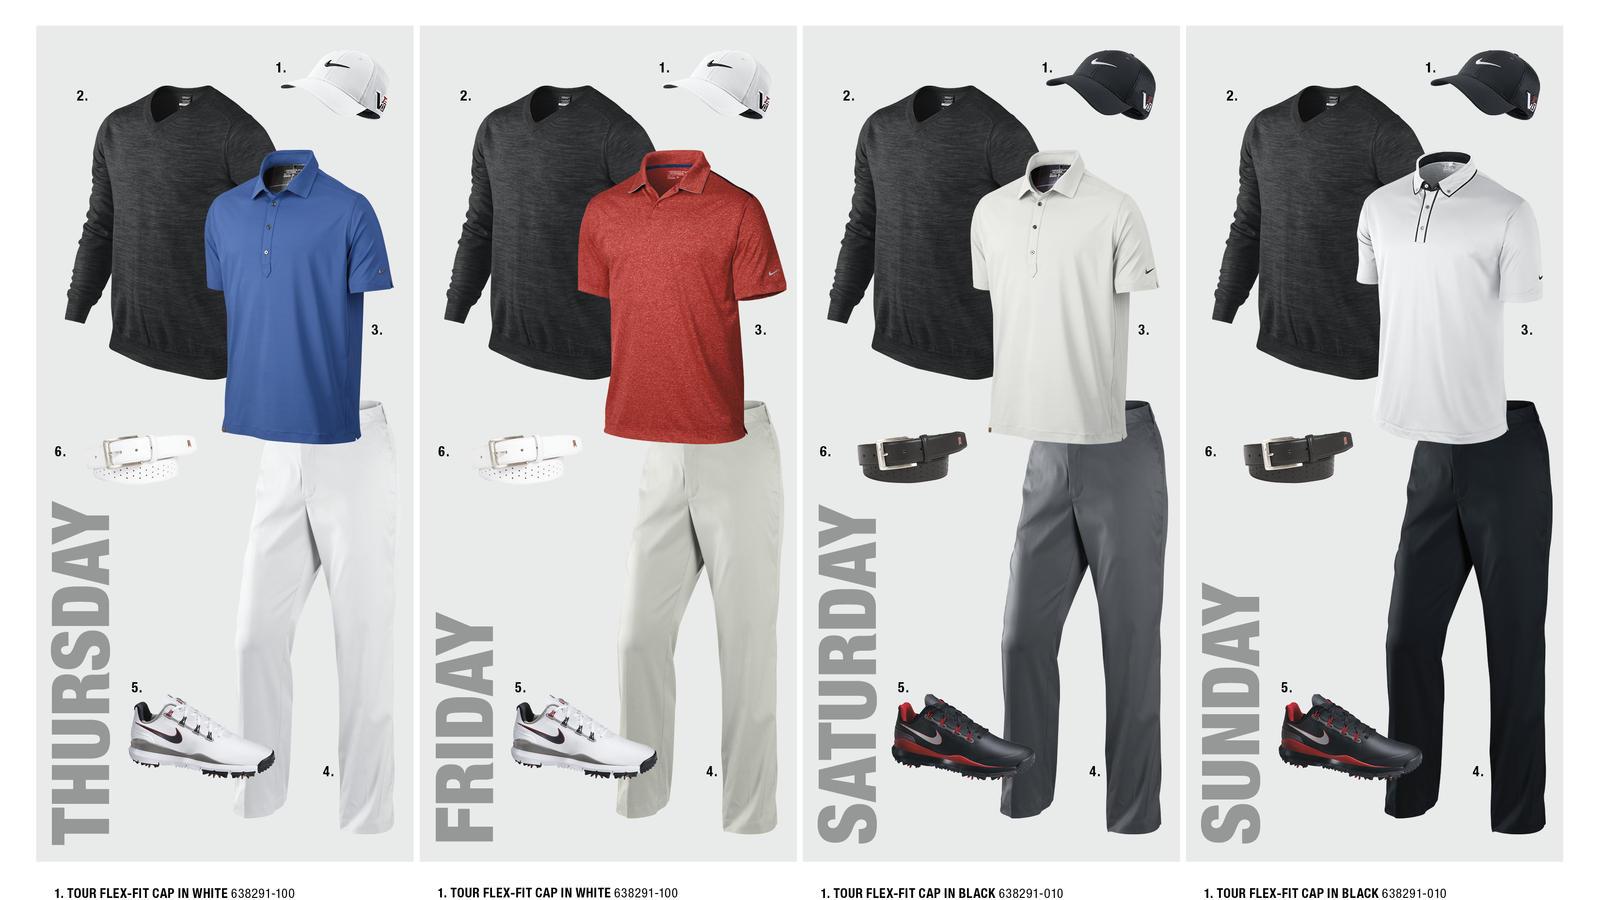 Scott Brown's Open Championship Looks